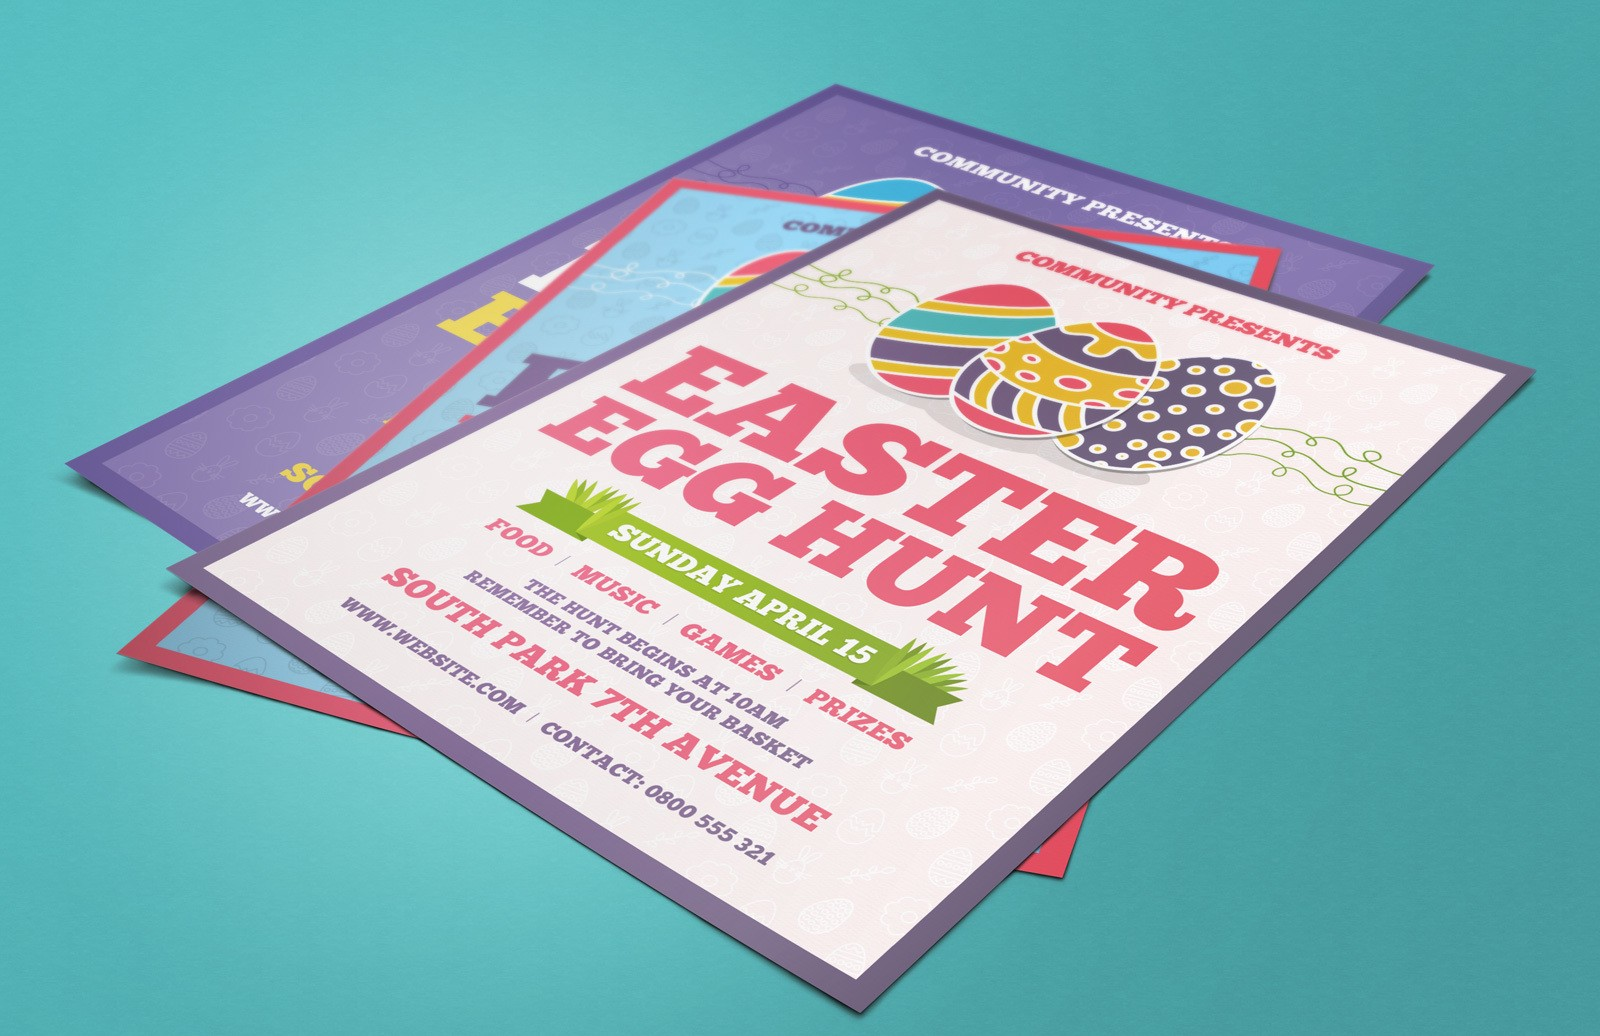 Free Easter Egg Hunt Flyer (AI, Word)